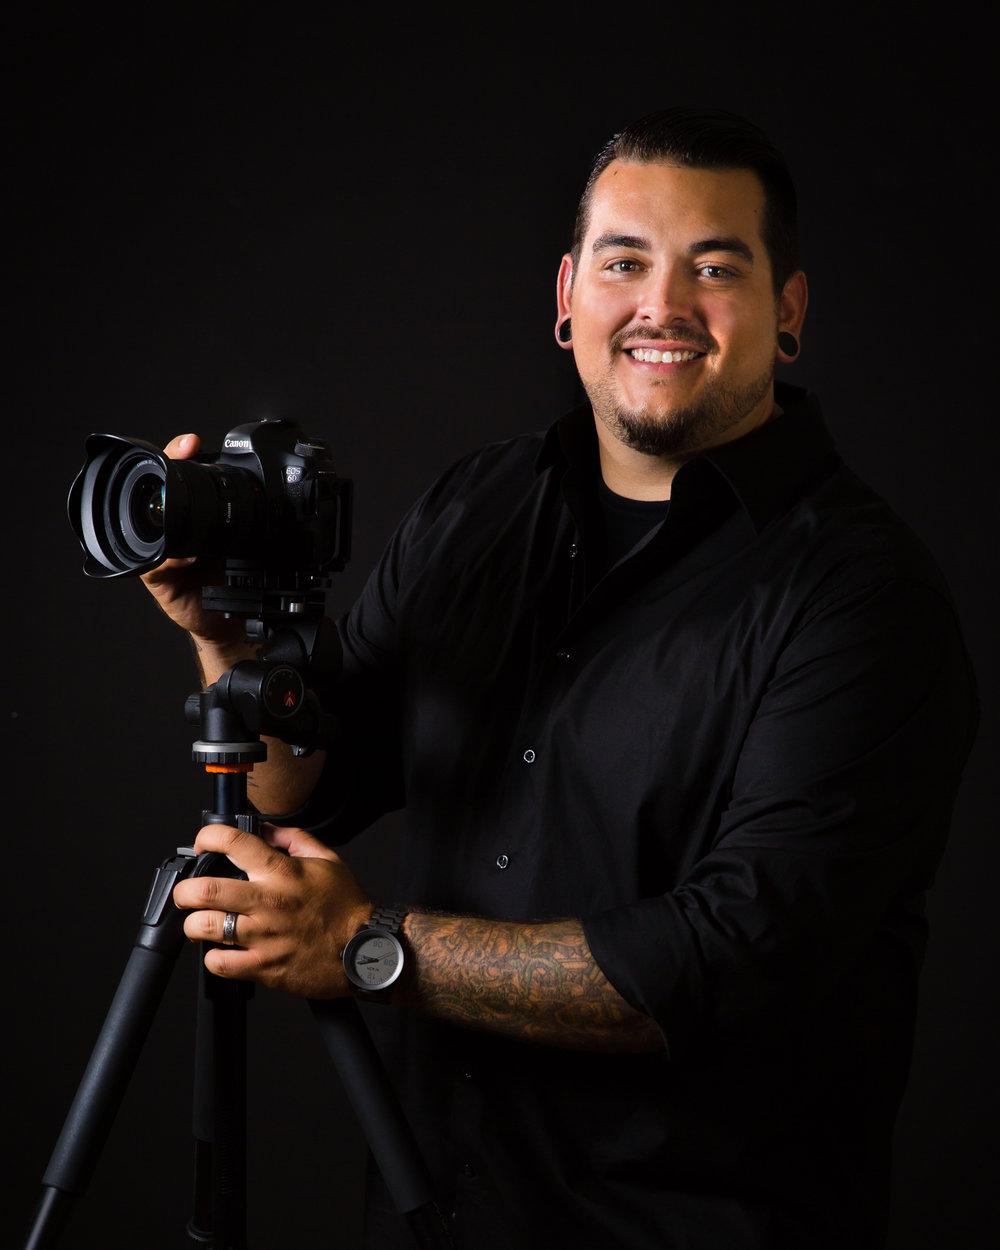 Gary-Kasl-SandKasl-Imaging-Portrait-Photography-4.jpg